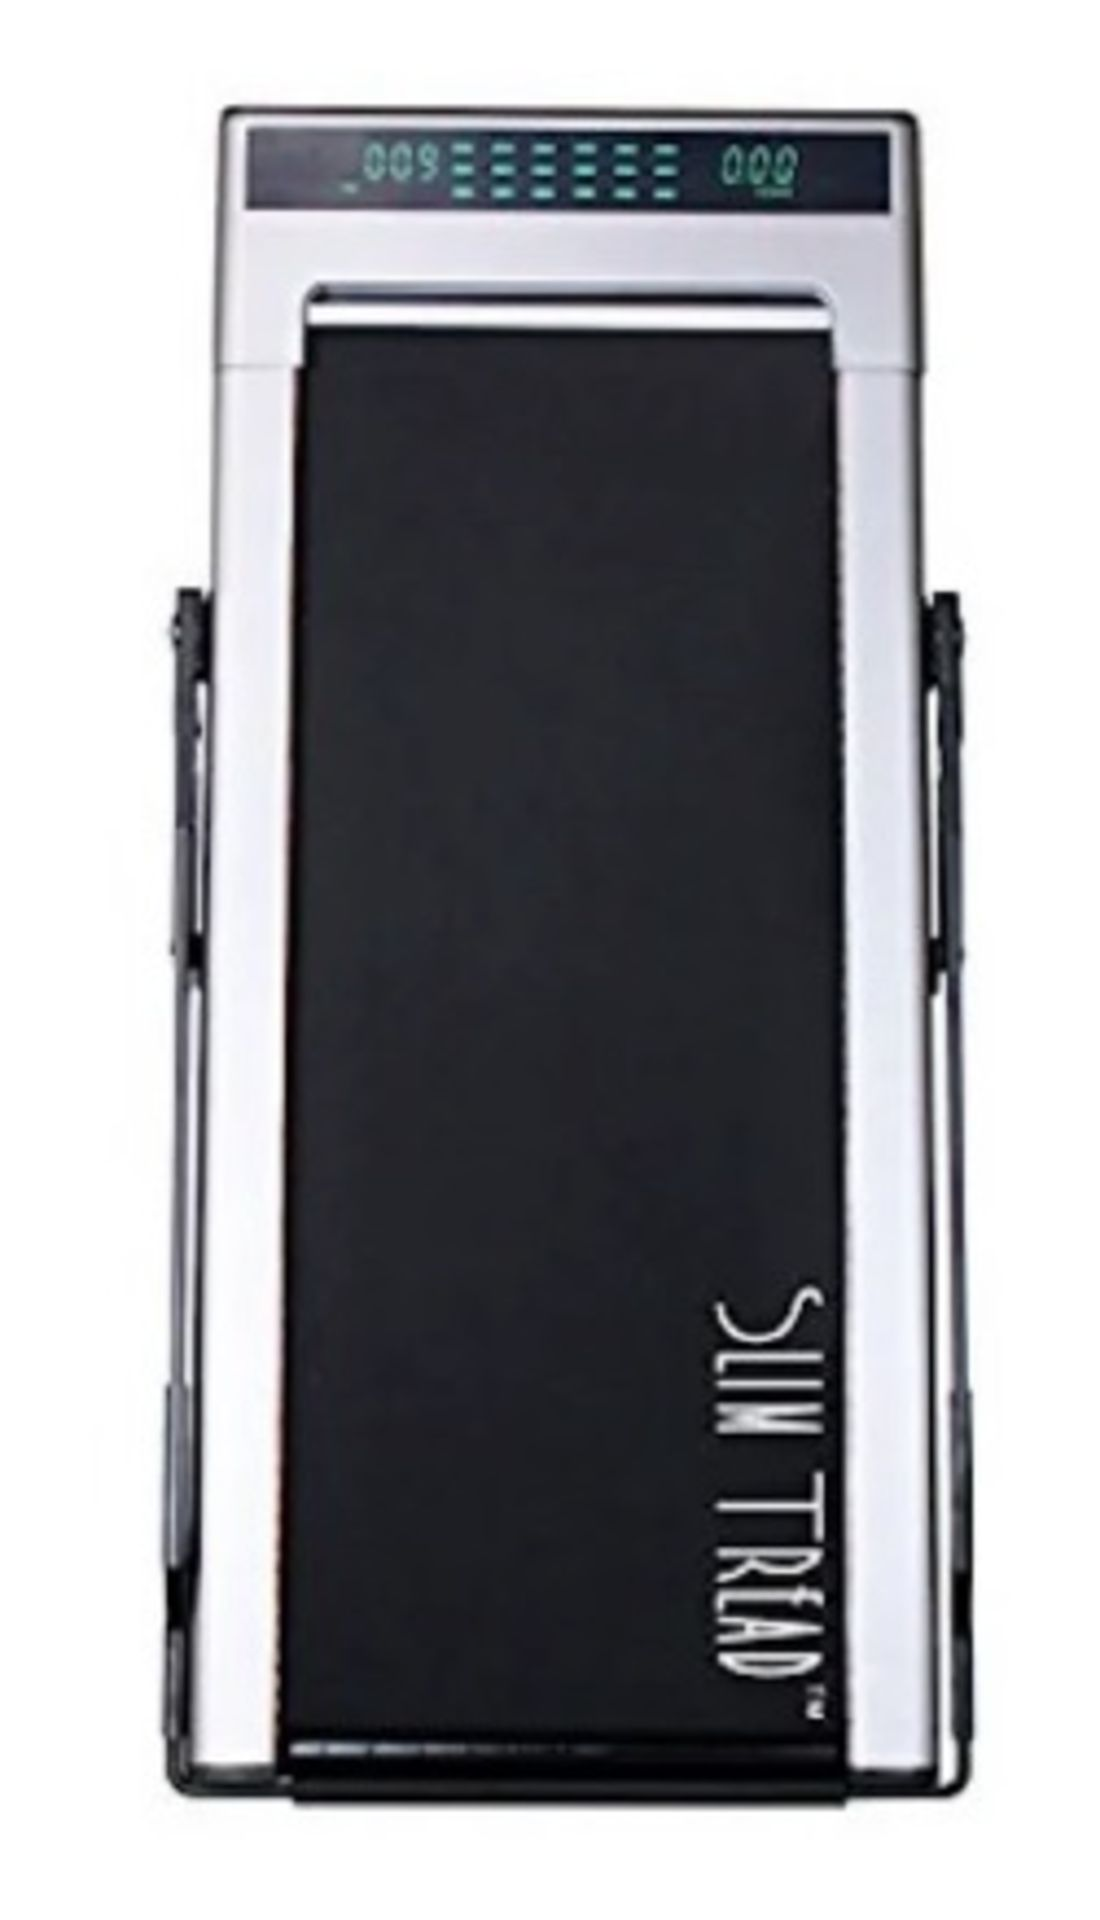 1 x Slim Tread Ultra Thin Smart Treadmill Running / Walking Machine - Lightweight With Folding - Image 10 of 23